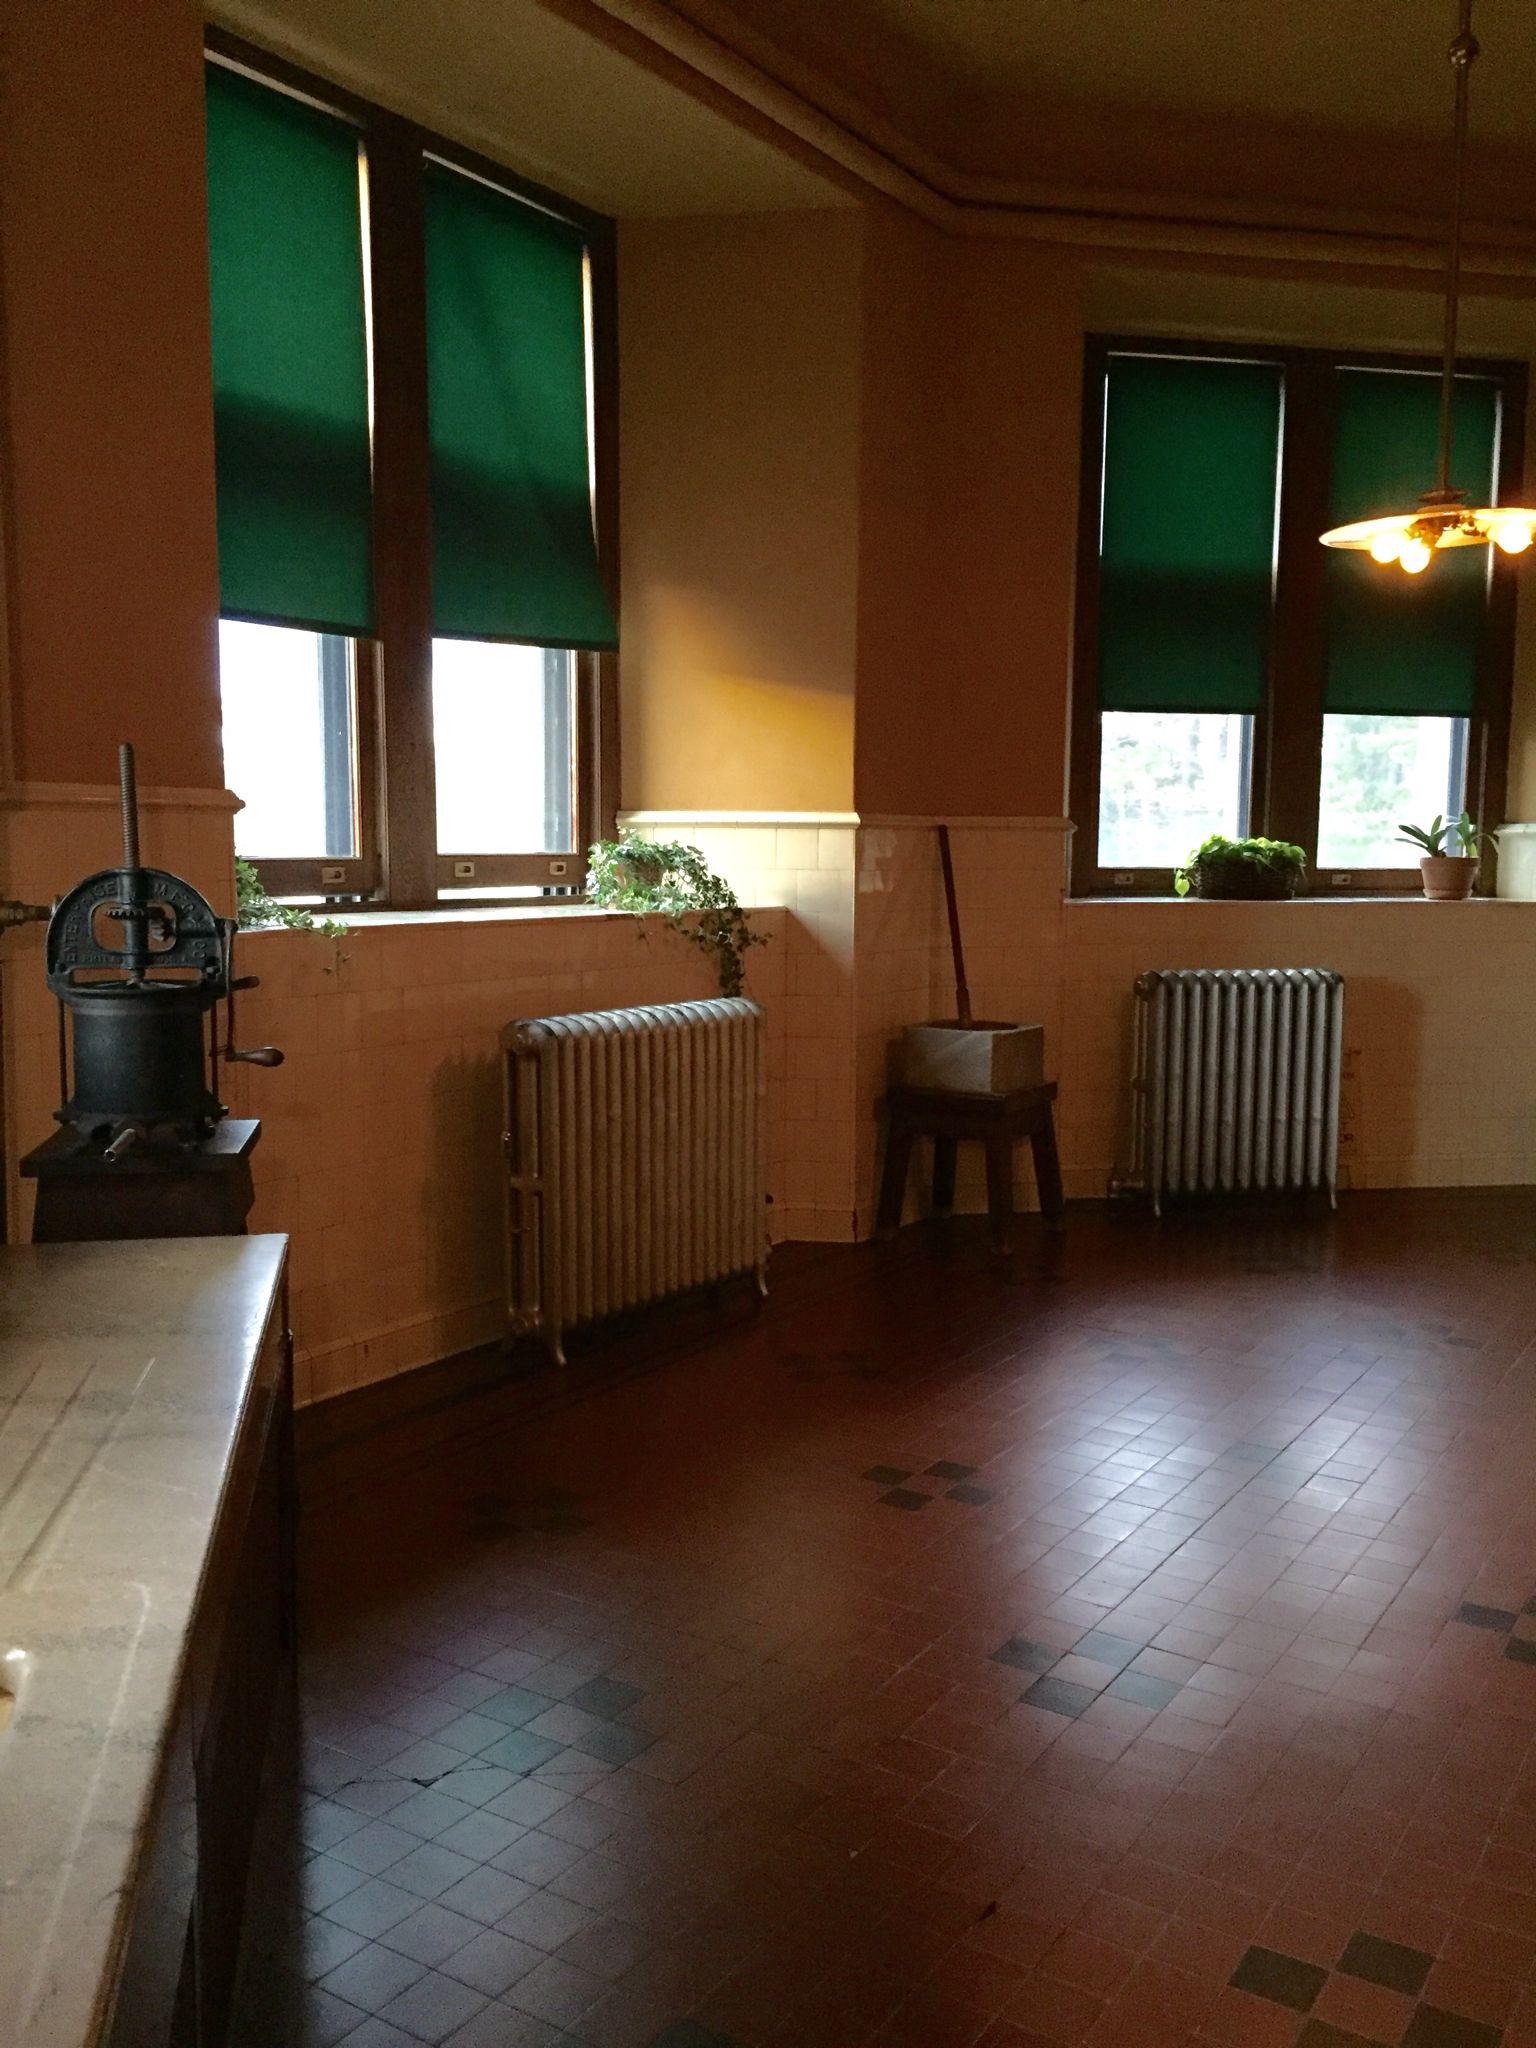 Biltmore - Kitchen February 2016 Visit